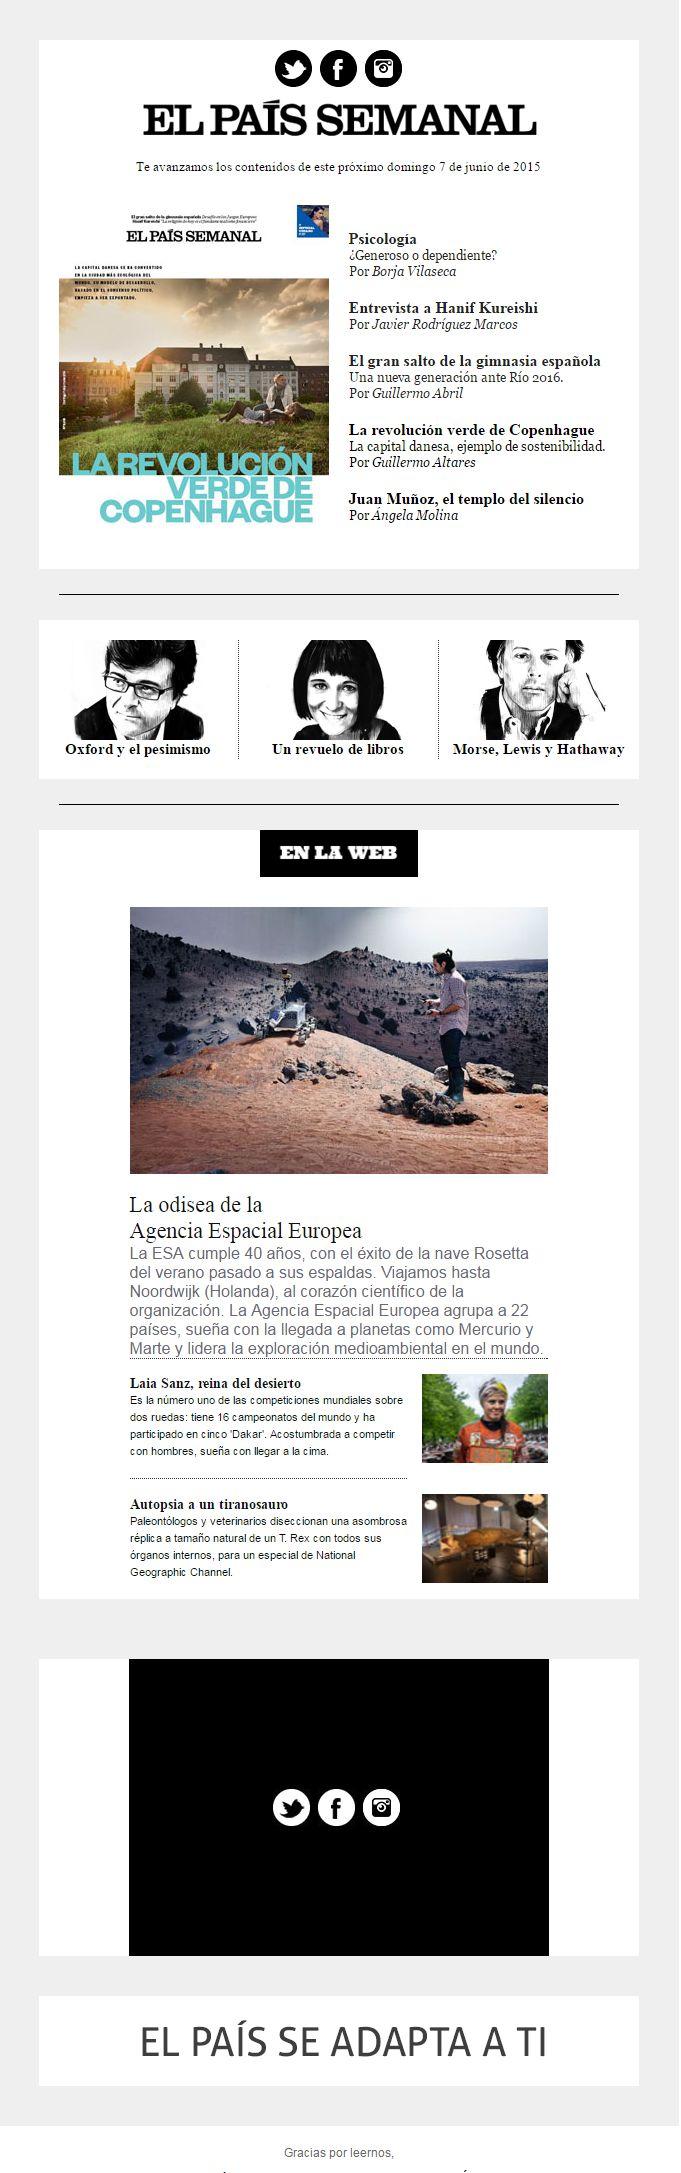 Newsletter El País Semanal